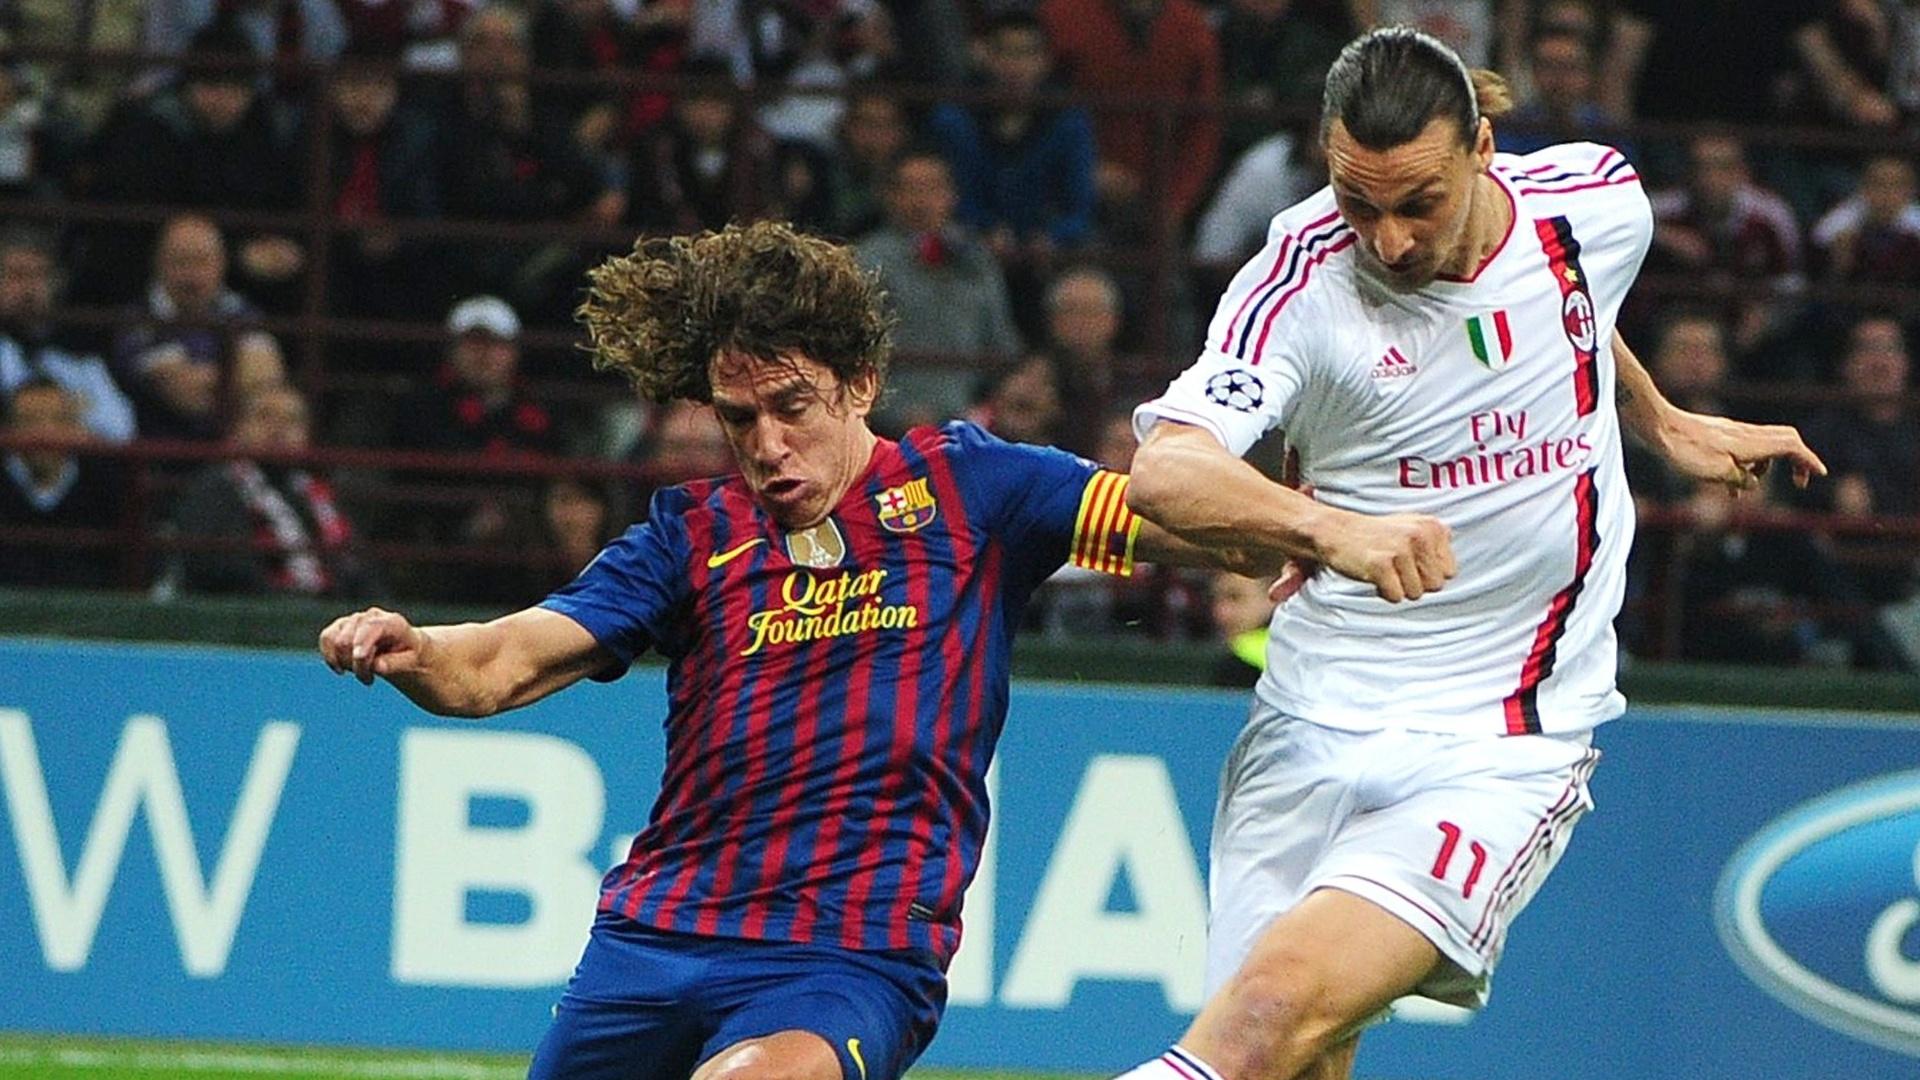 Charles Puyol chega atrasado na definição do sueco Zlatan Ibrahimovic